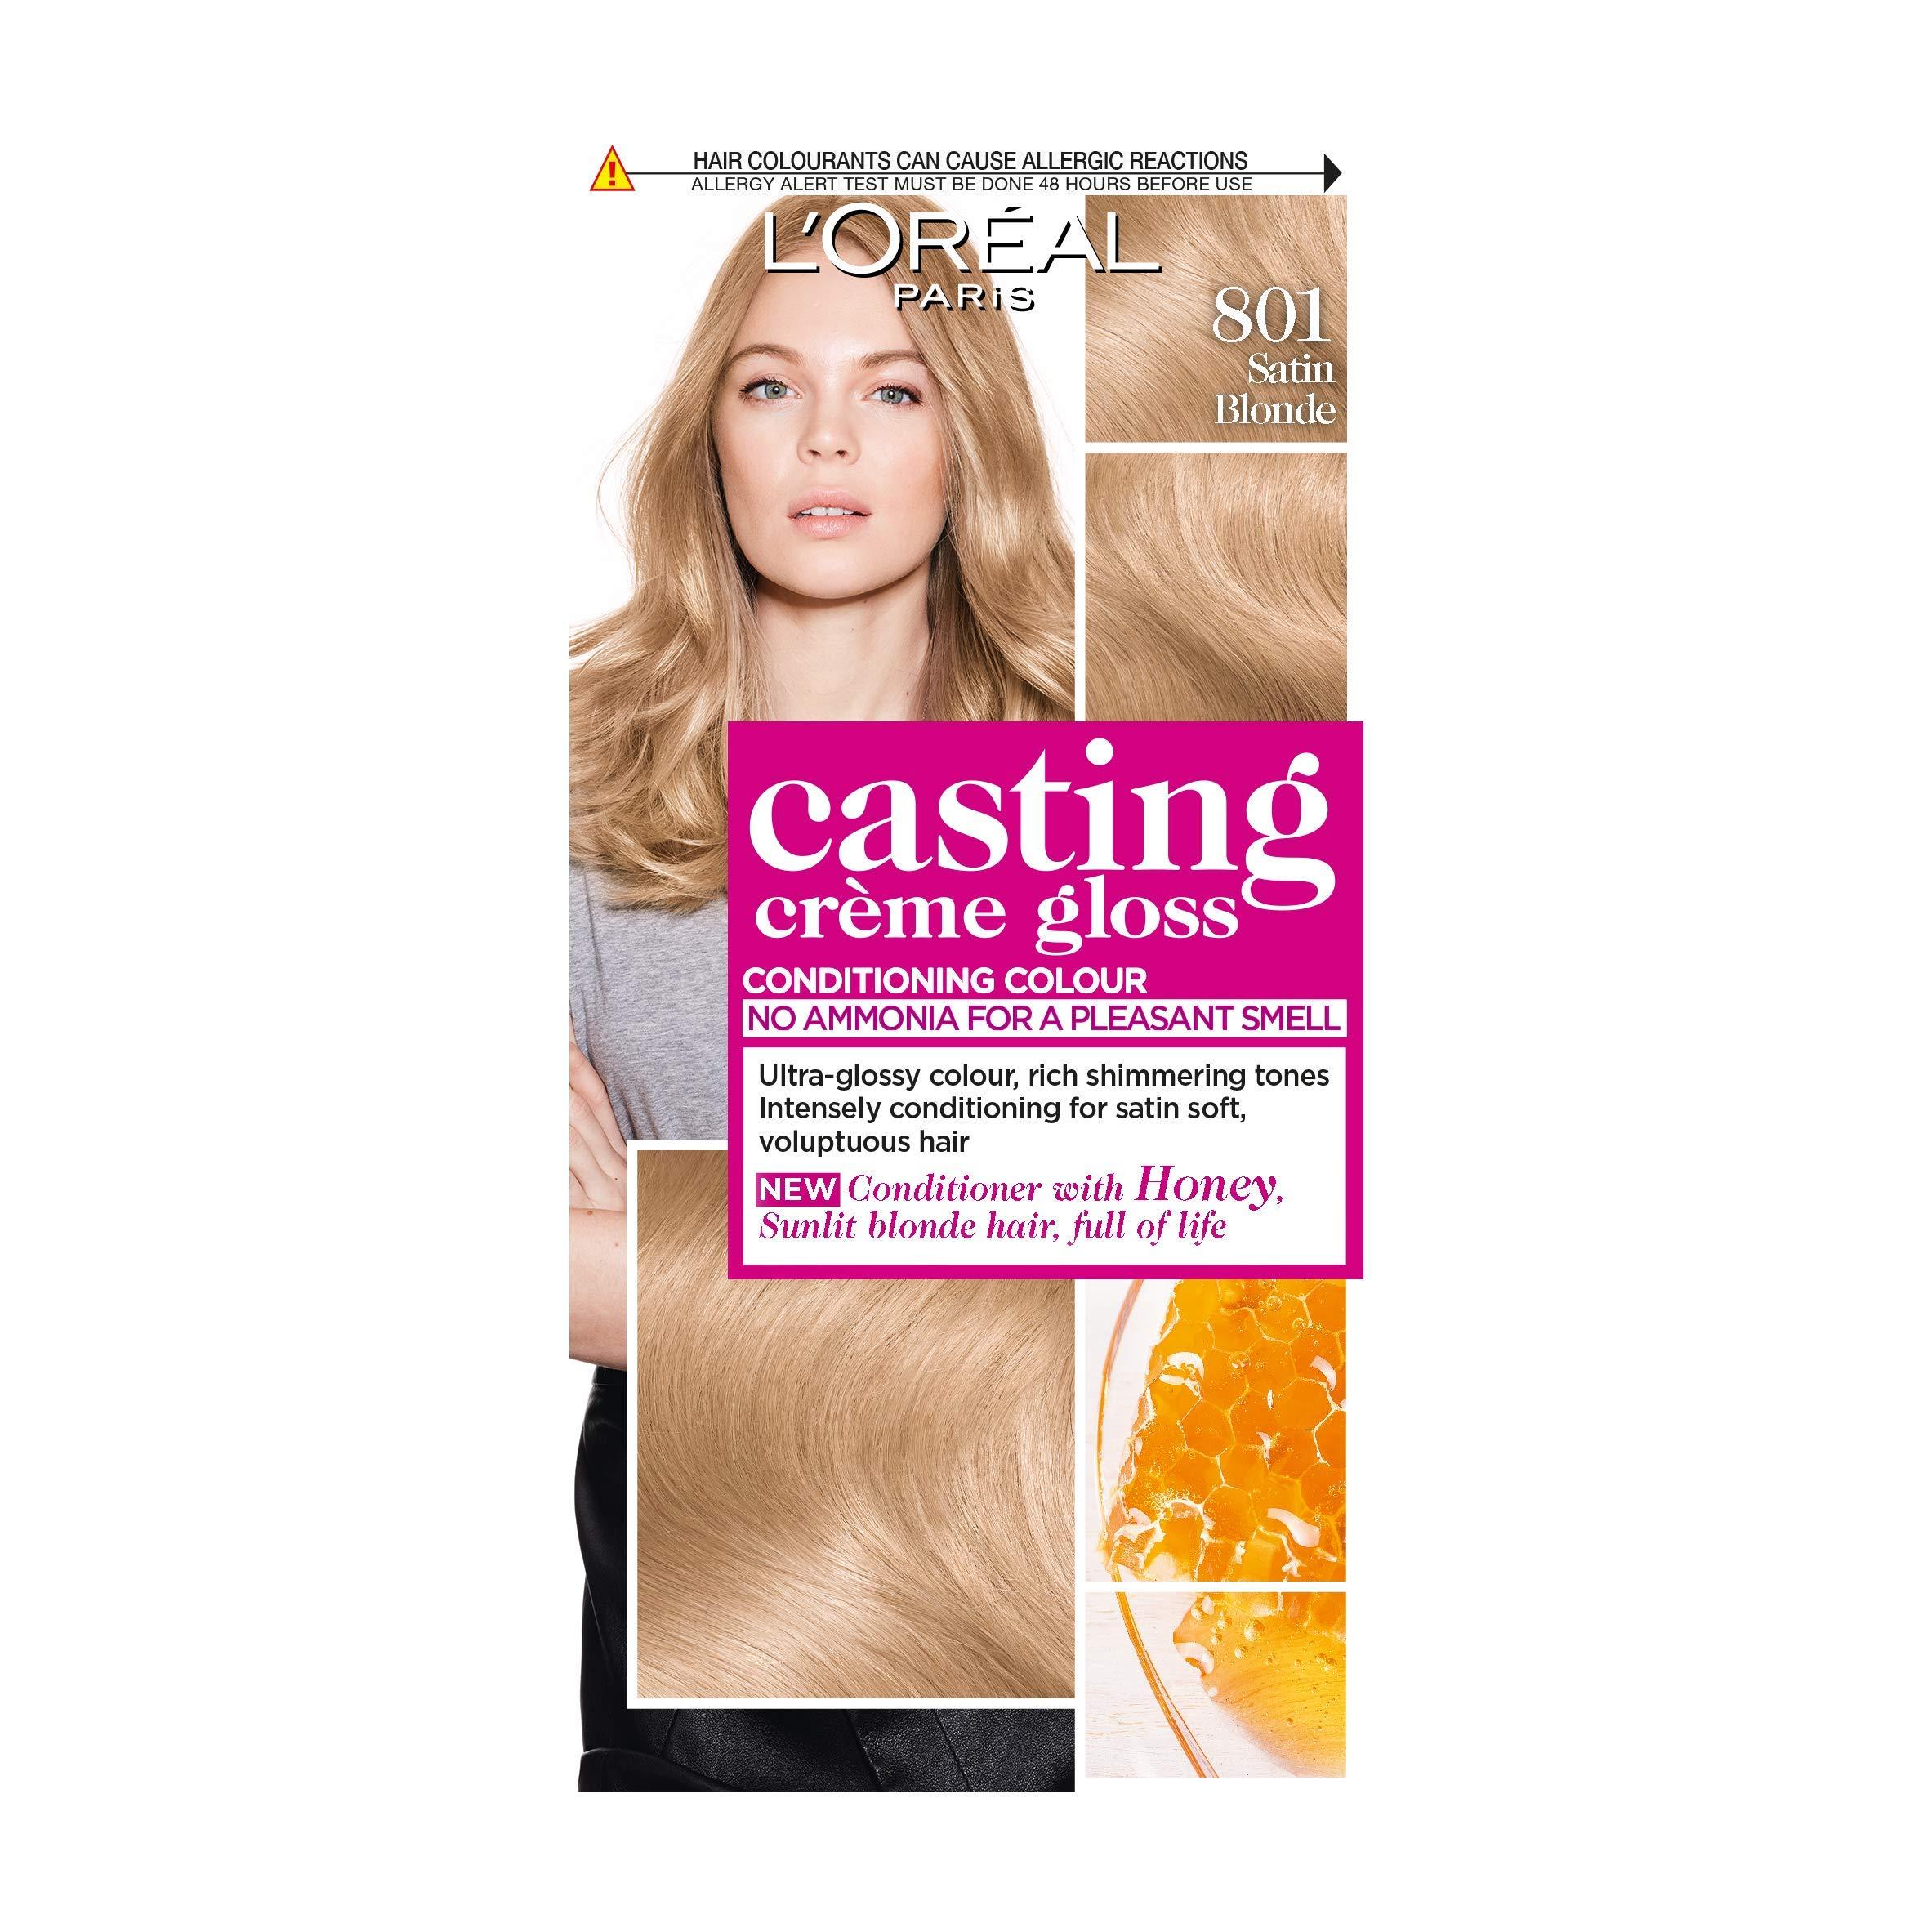 L'Oreal Paris Casting Creme Gloss Semi-Permanent Blonde Hair Dye, Blends Away Grey Hair Leaving a Radiant Hair Colour, Blonde Hair Dye 801 Satin Blonde